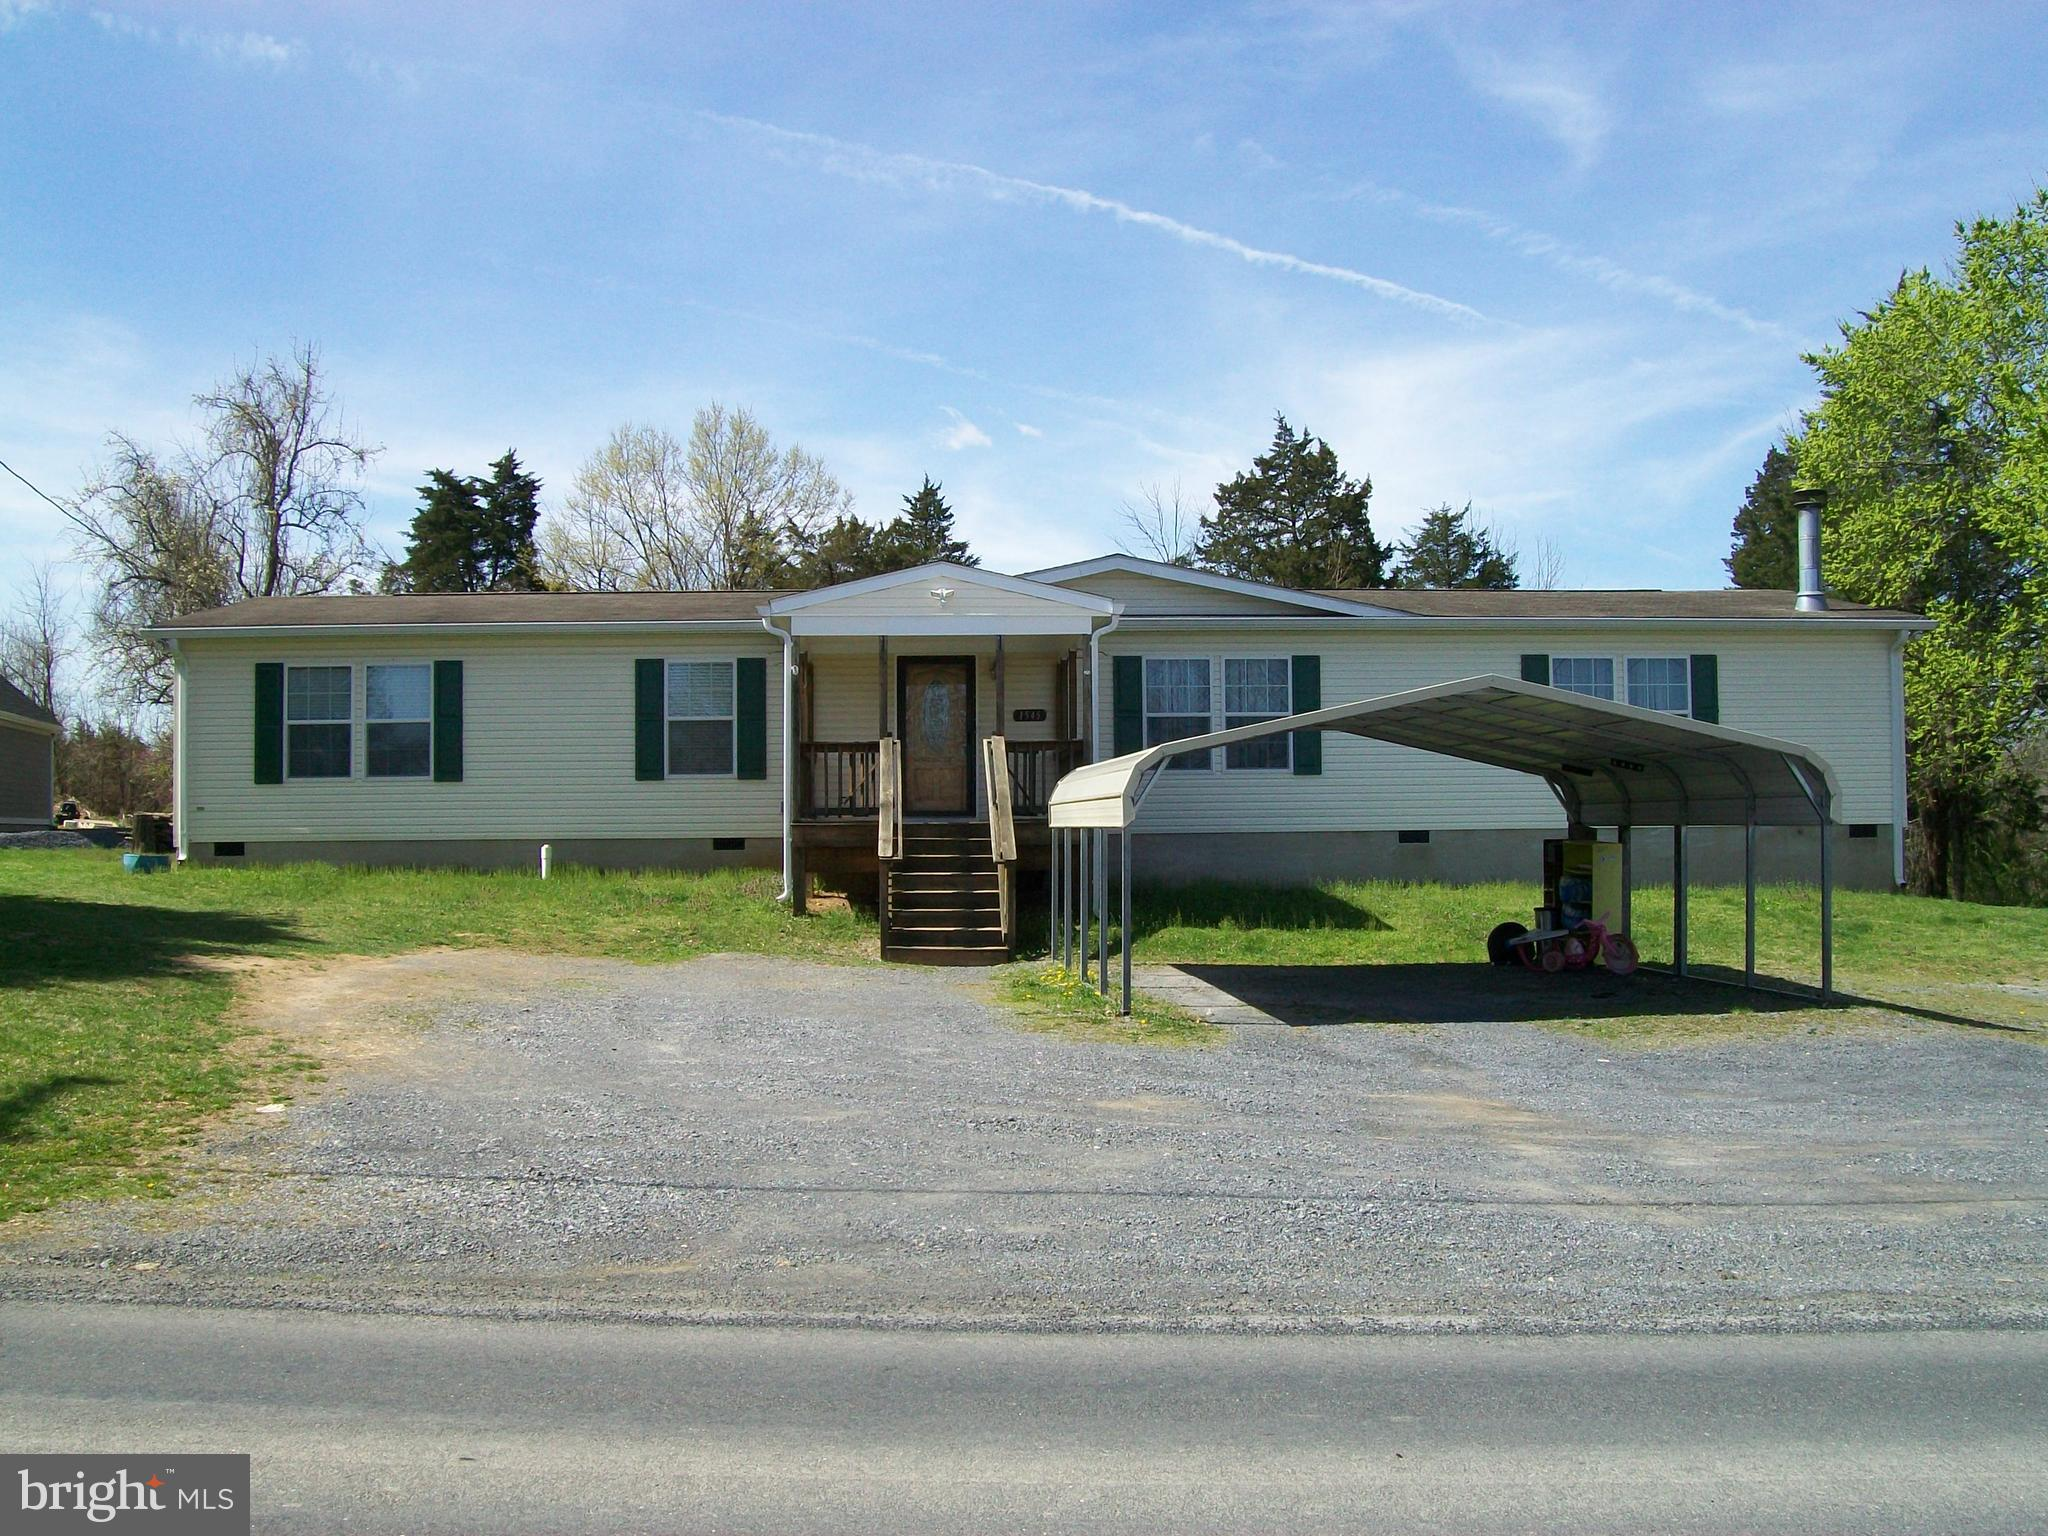 1545 HAHNS LANE, TOMS BROOK, VA 22660